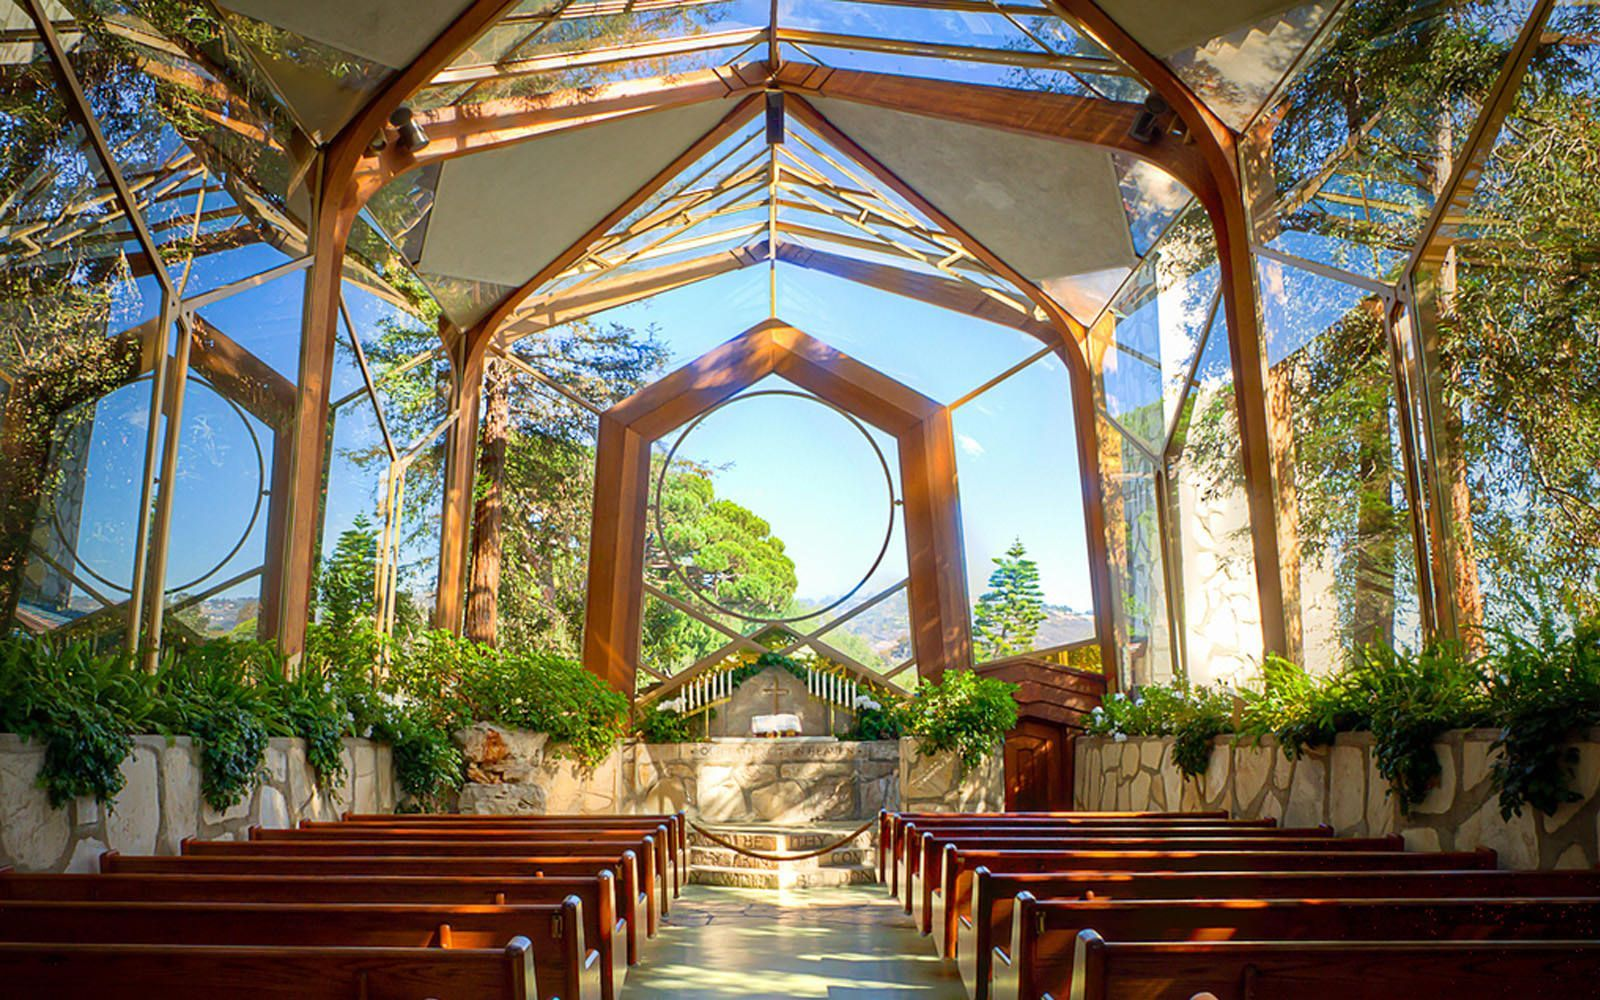 Wayfarers Chapel Best Beach Wedding Locations Los Angeles Area Small Wedding Venue Southern Frank Lloyd Wright Architecture Frank Lloyd Wright Architecture